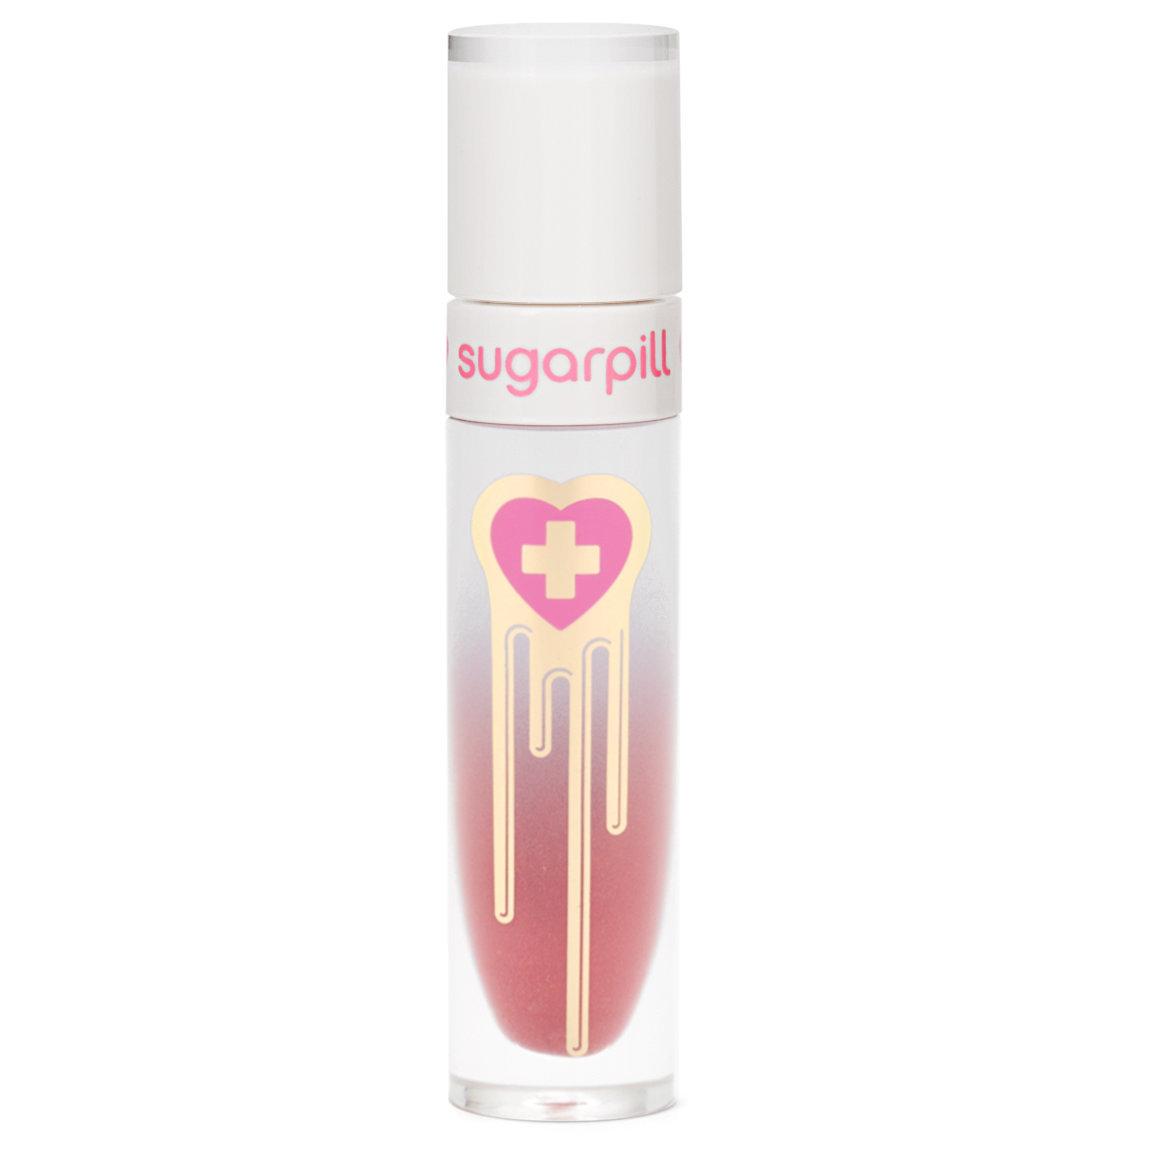 Sugarpill Cosmetics Liquid Lip Color Keepsake alternative view 1.